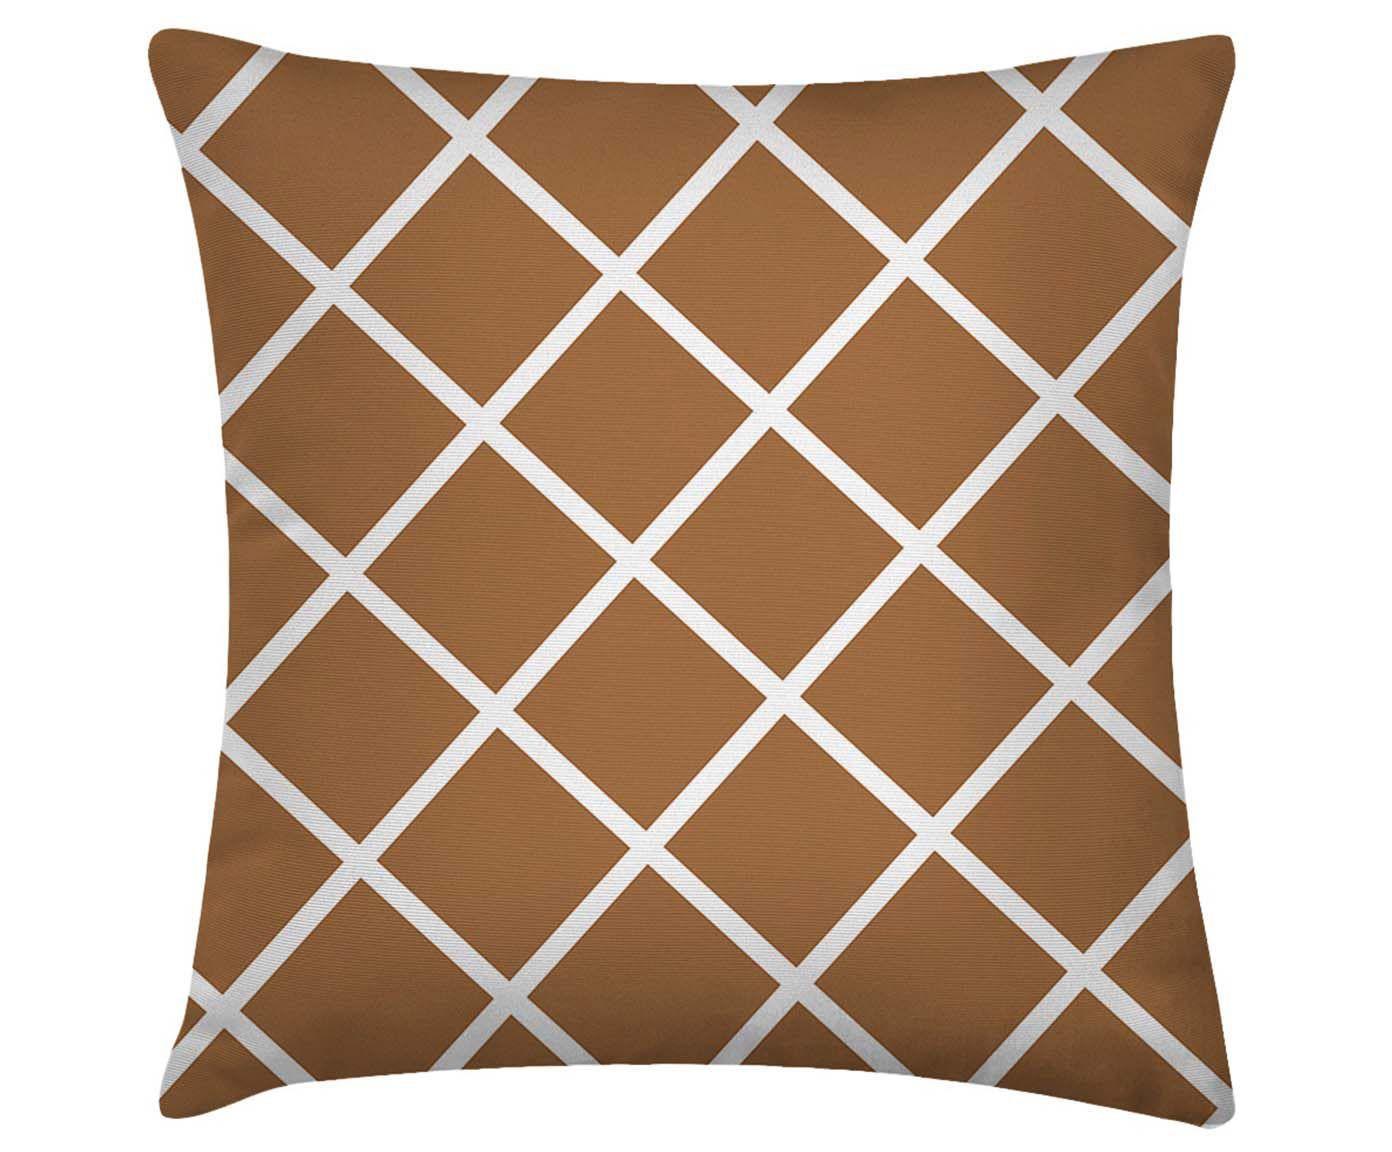 Capa para almofada losangue lana - 40 cm   Westwing.com.br